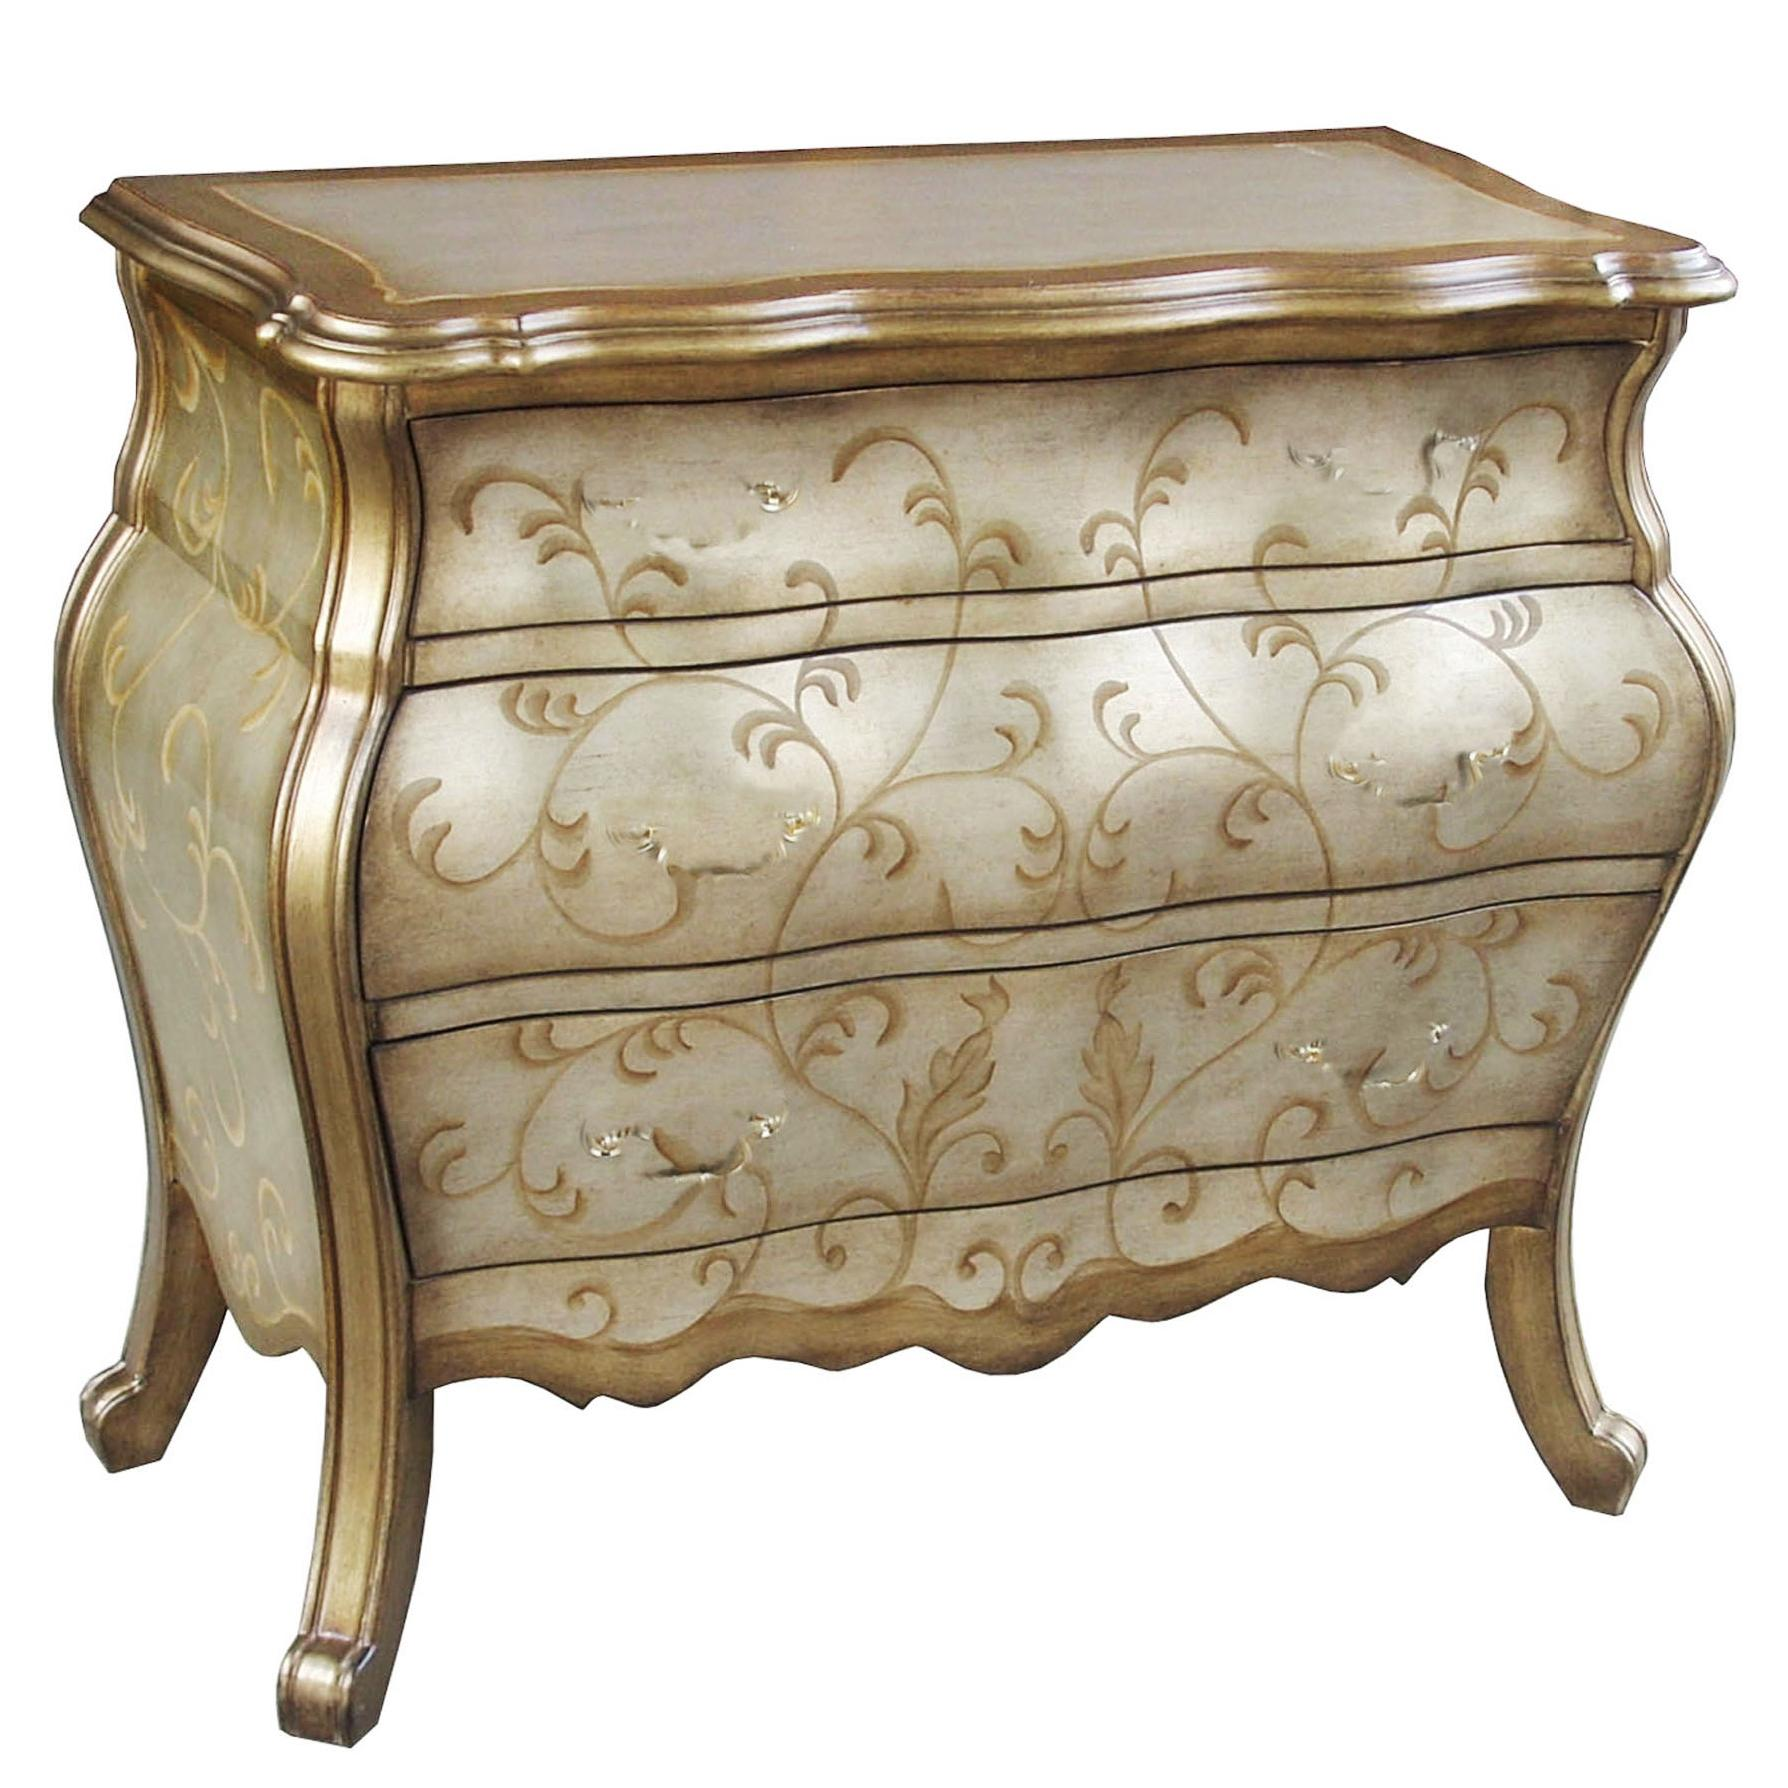 Pulaski furniture accents meryl timeless accent chest for Pulaski furniture